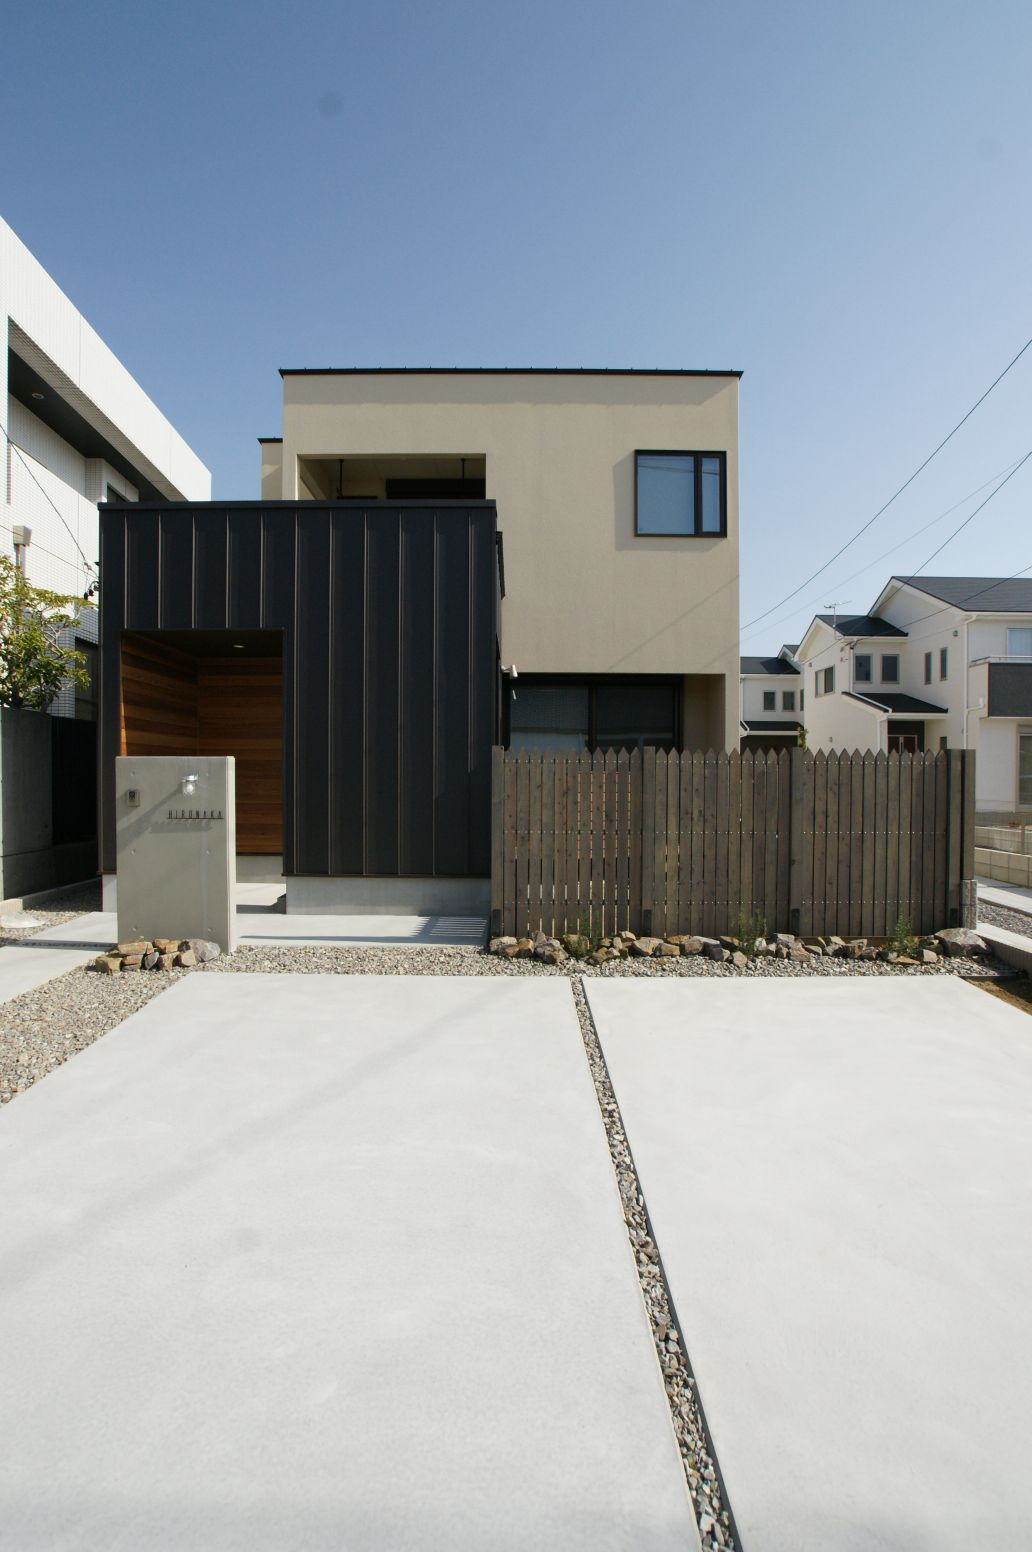 RIKYU (リキュー)【デザイン住宅、省エネ、インテリア】周囲の景観まで引き立たせる洗練された外観